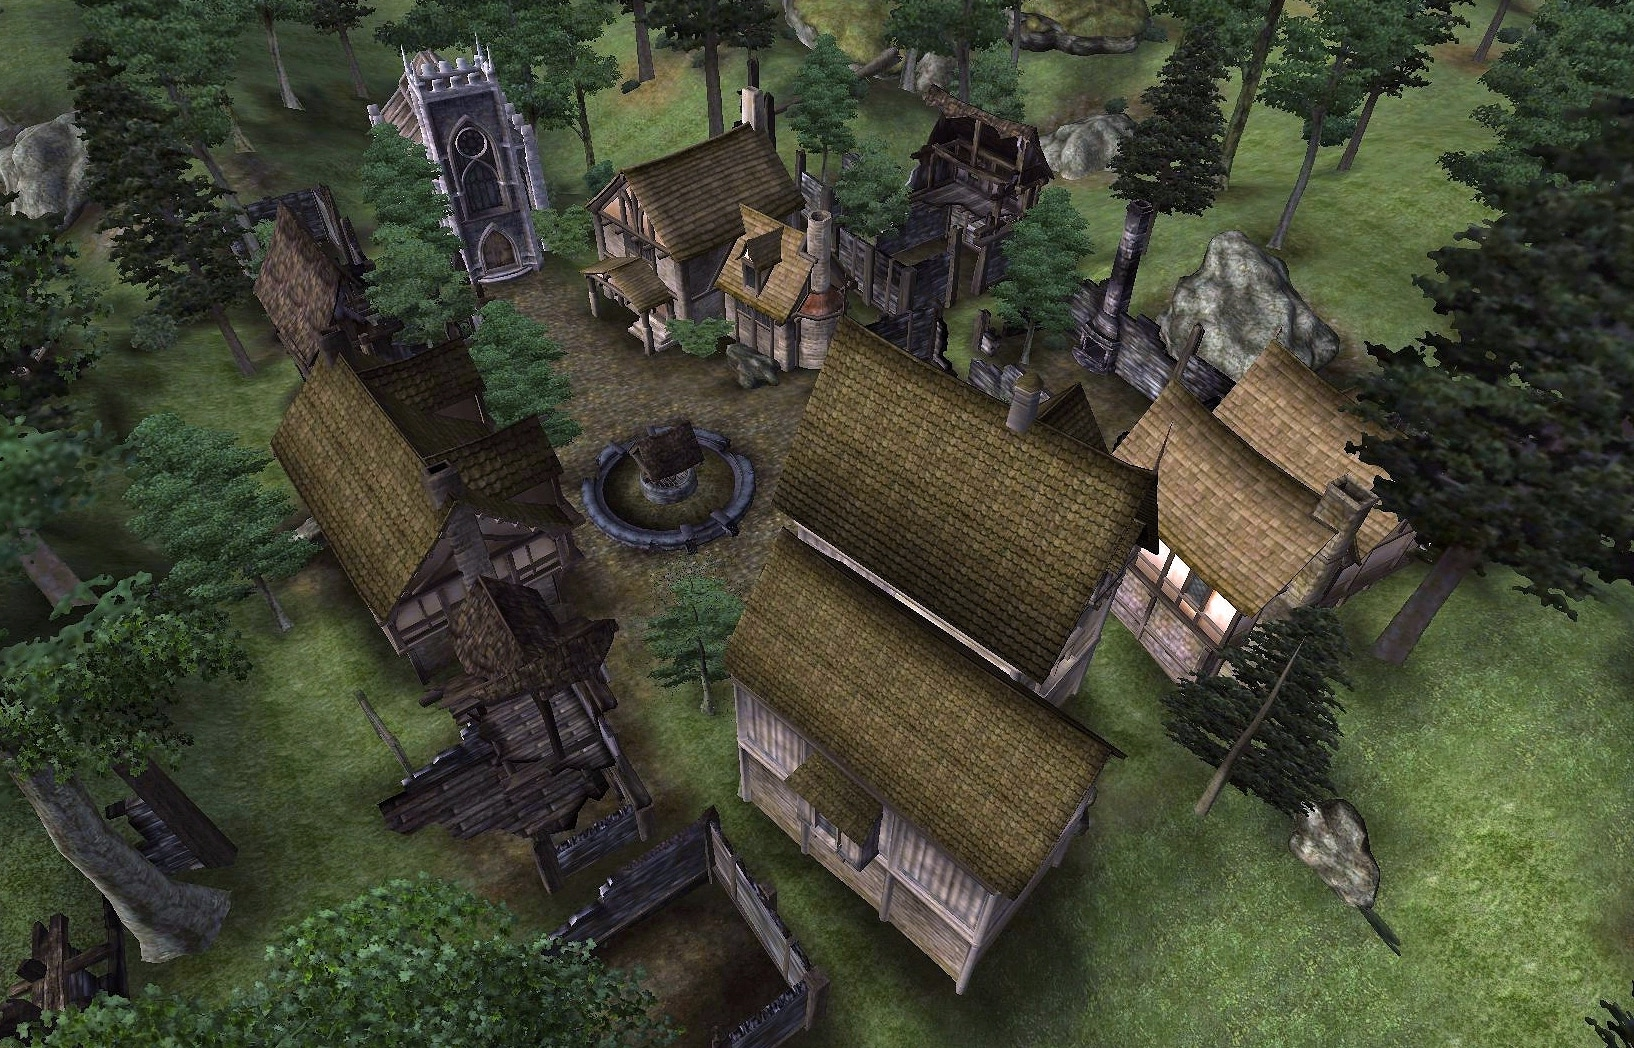 The Elder Scrolls IV: Oblivion NPCs Radiant AI NPC chaos murder theft from Bethesda and Todd Howard